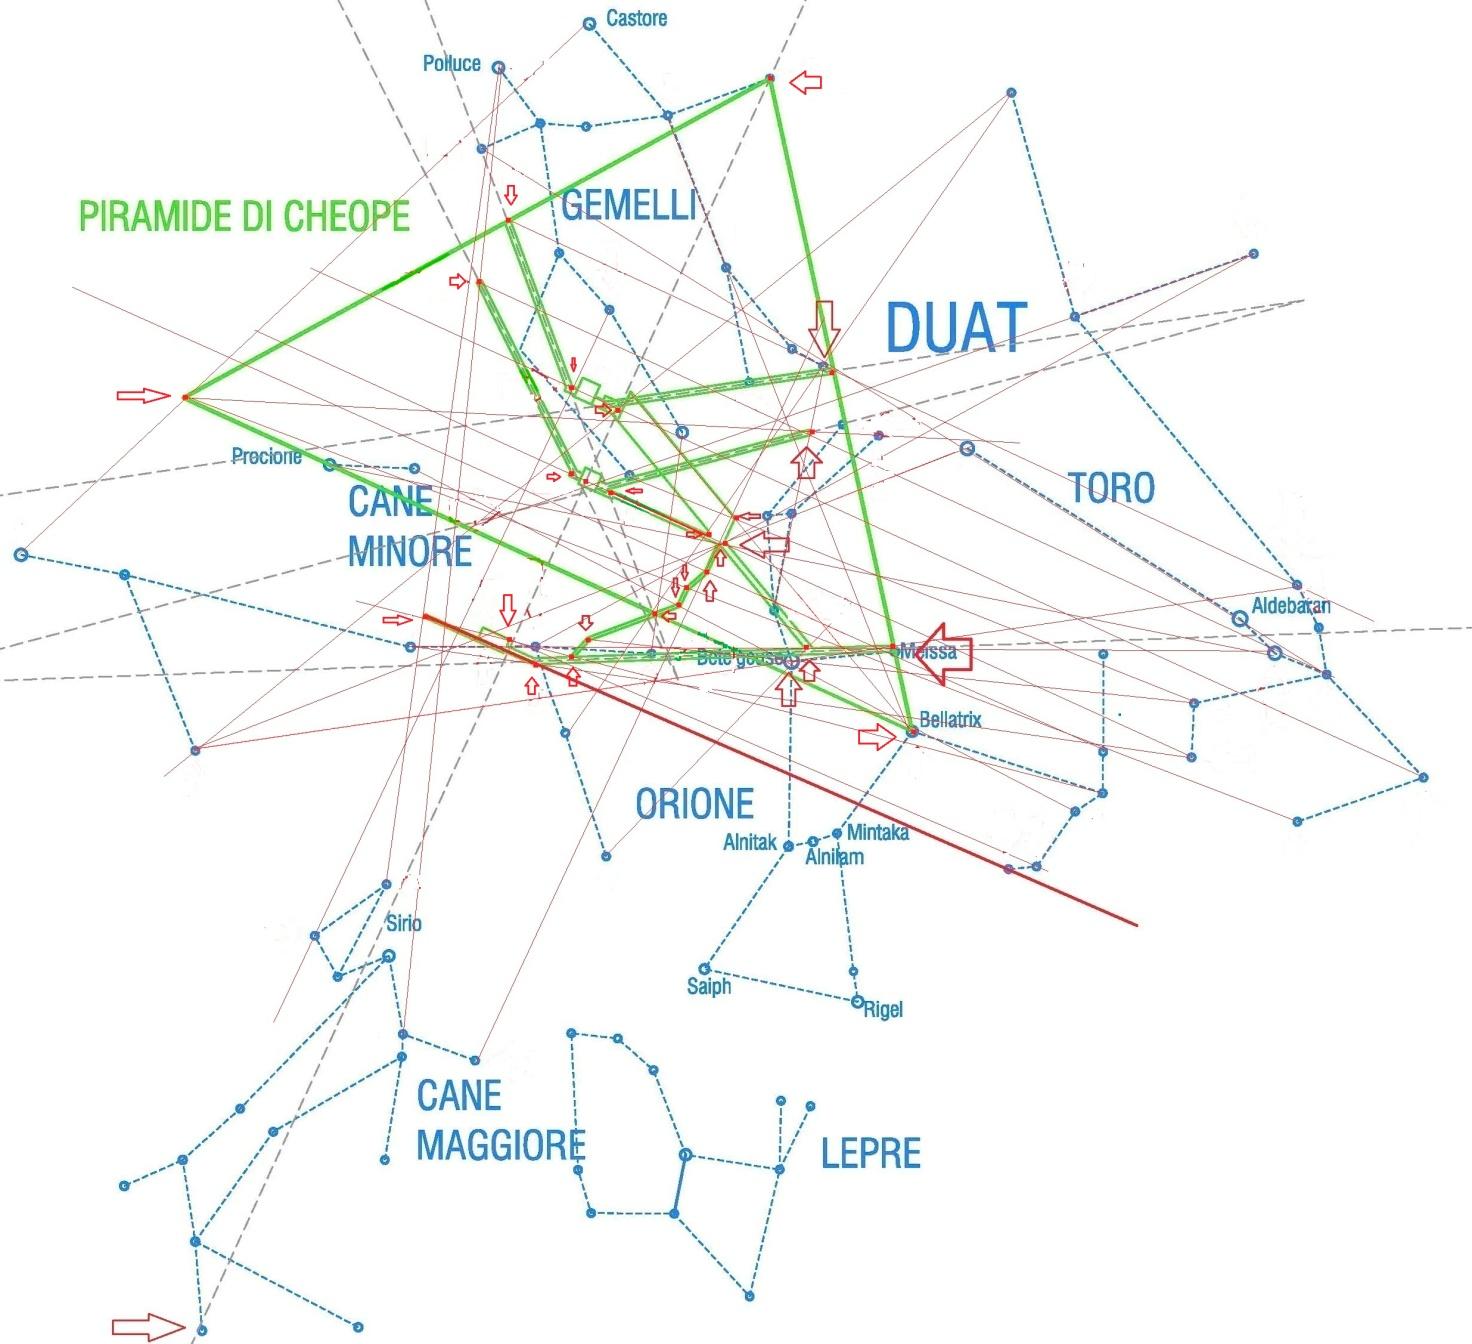 C:\Users\Gabriele\Pictures\1.NUOVI ARTICOLI\the snefru code parte 15 cygnus giza correlation\24\c.jpg